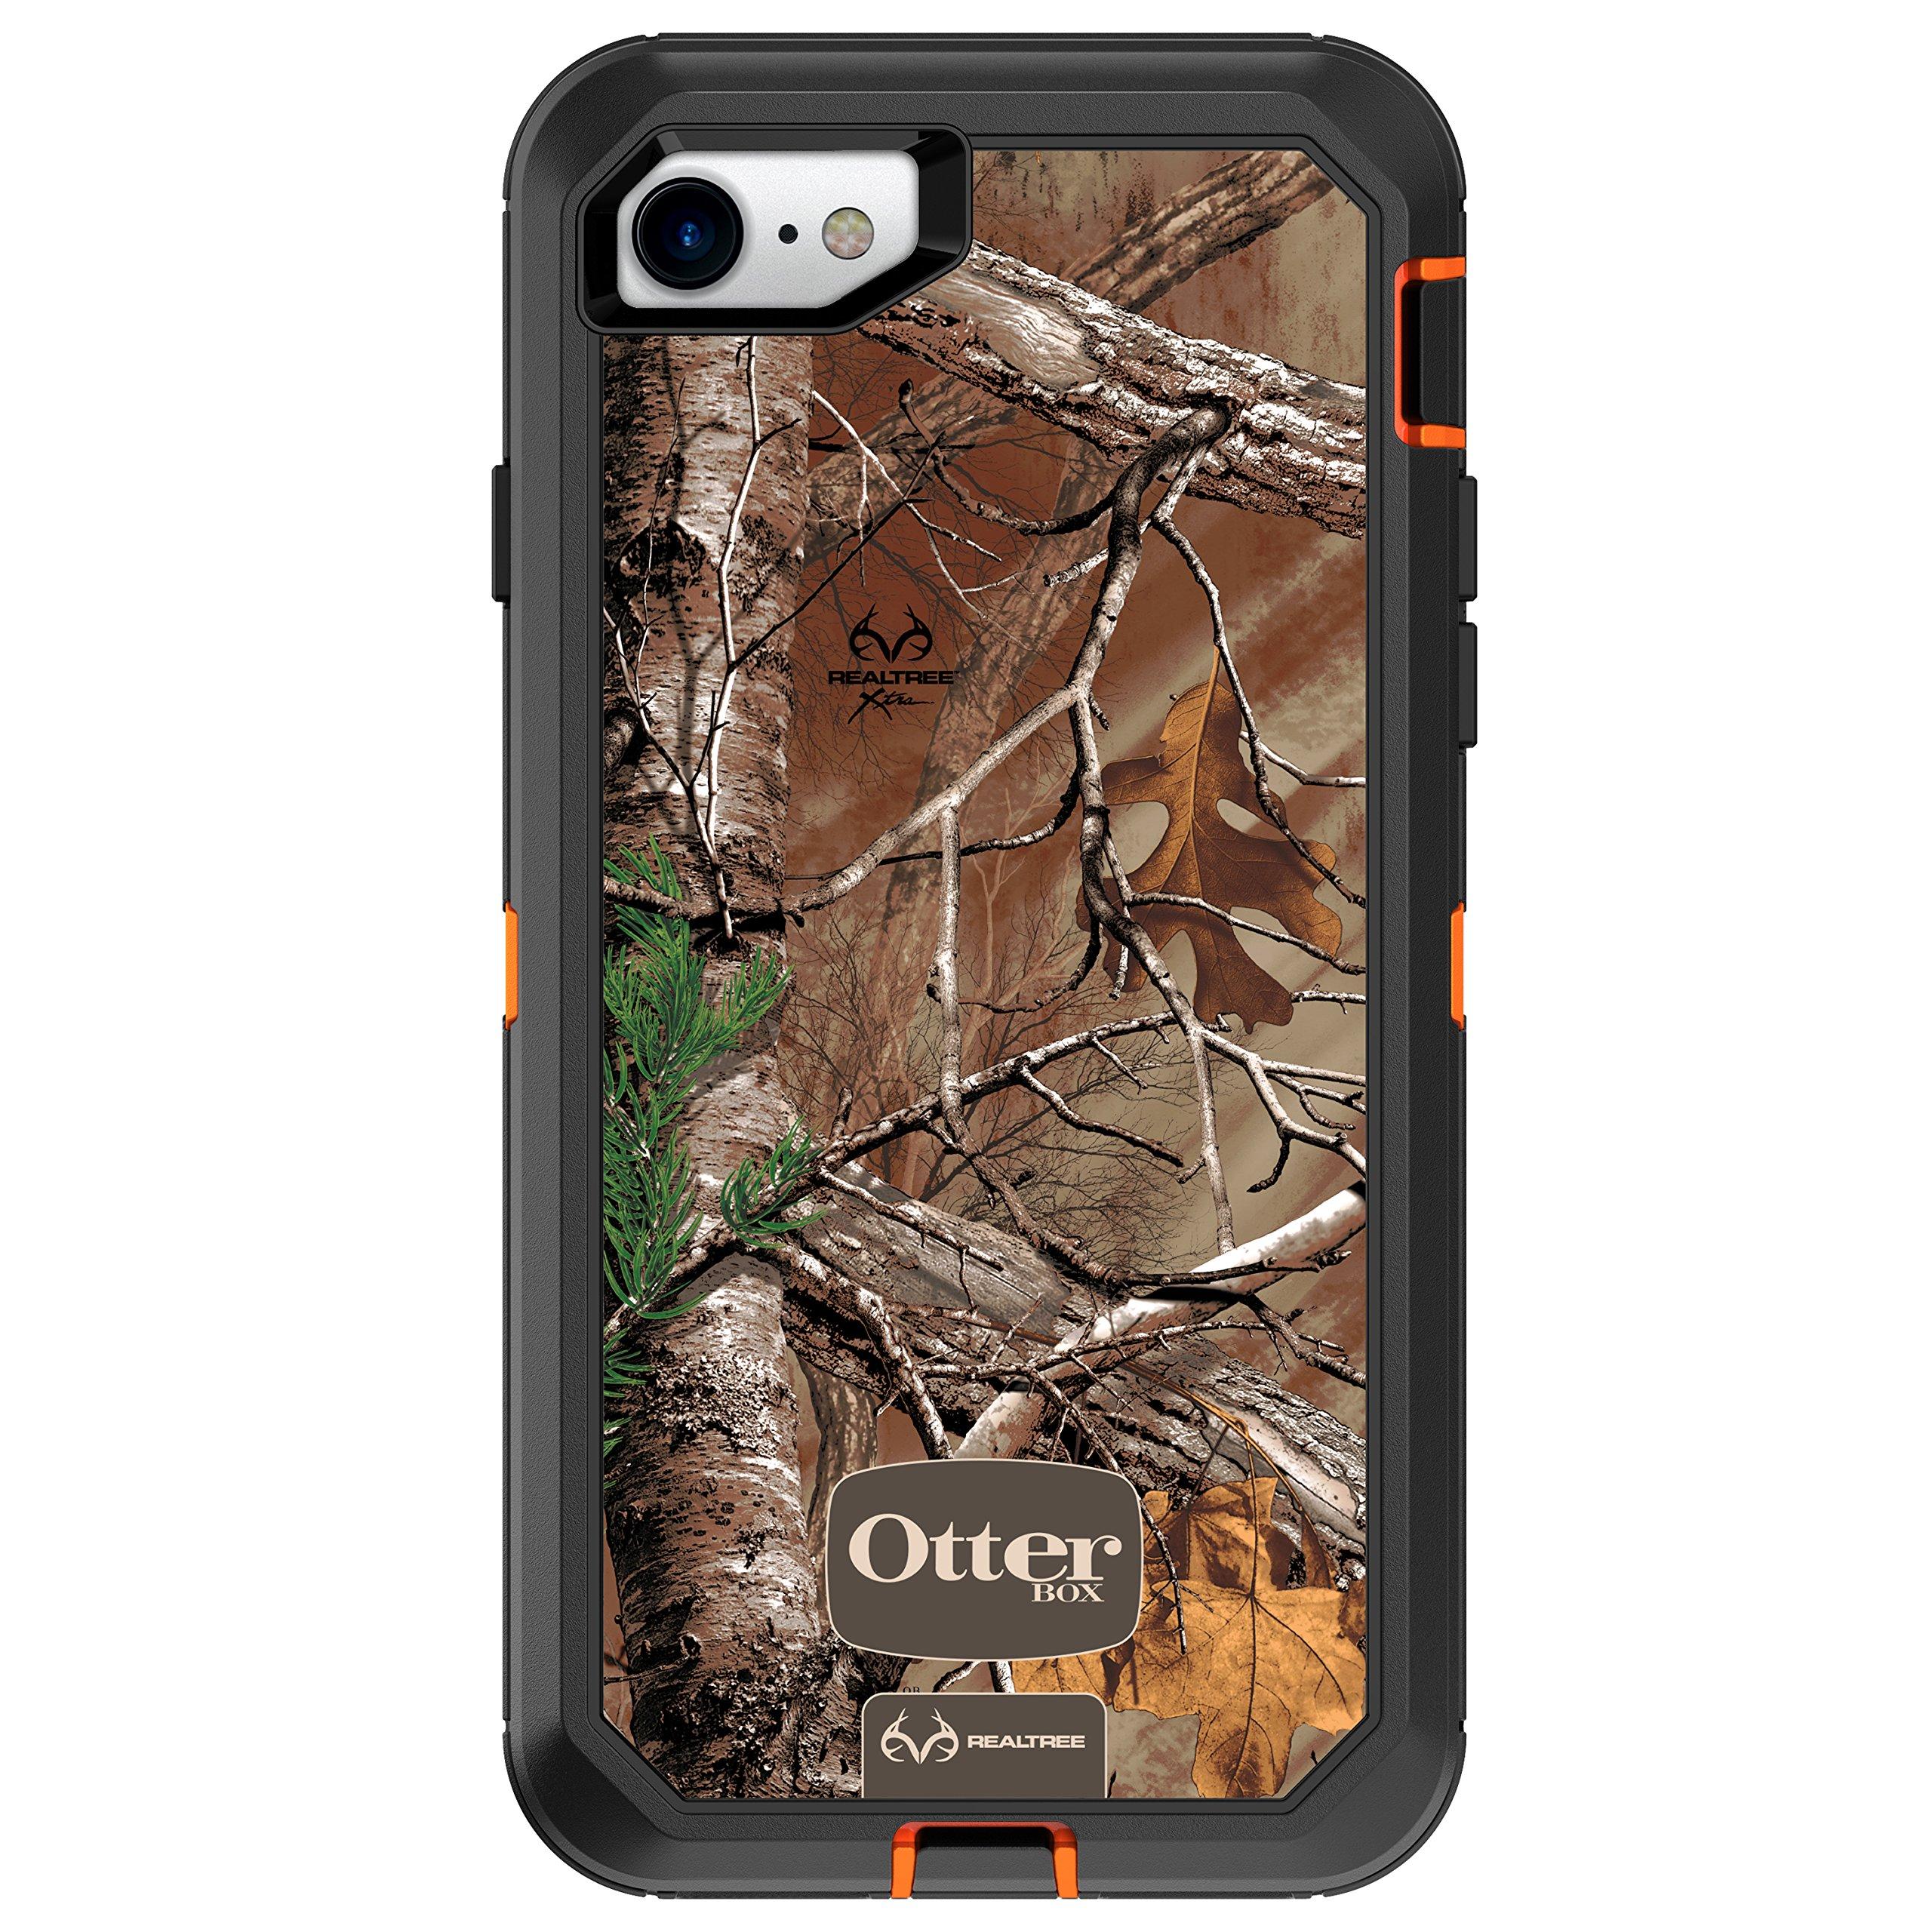 OtterBox Defender Series Case for iPhone 8 & iPhone 7 (NOT Plus) - (Blaze Orange/Black W/Realtree Xtra CAMO)